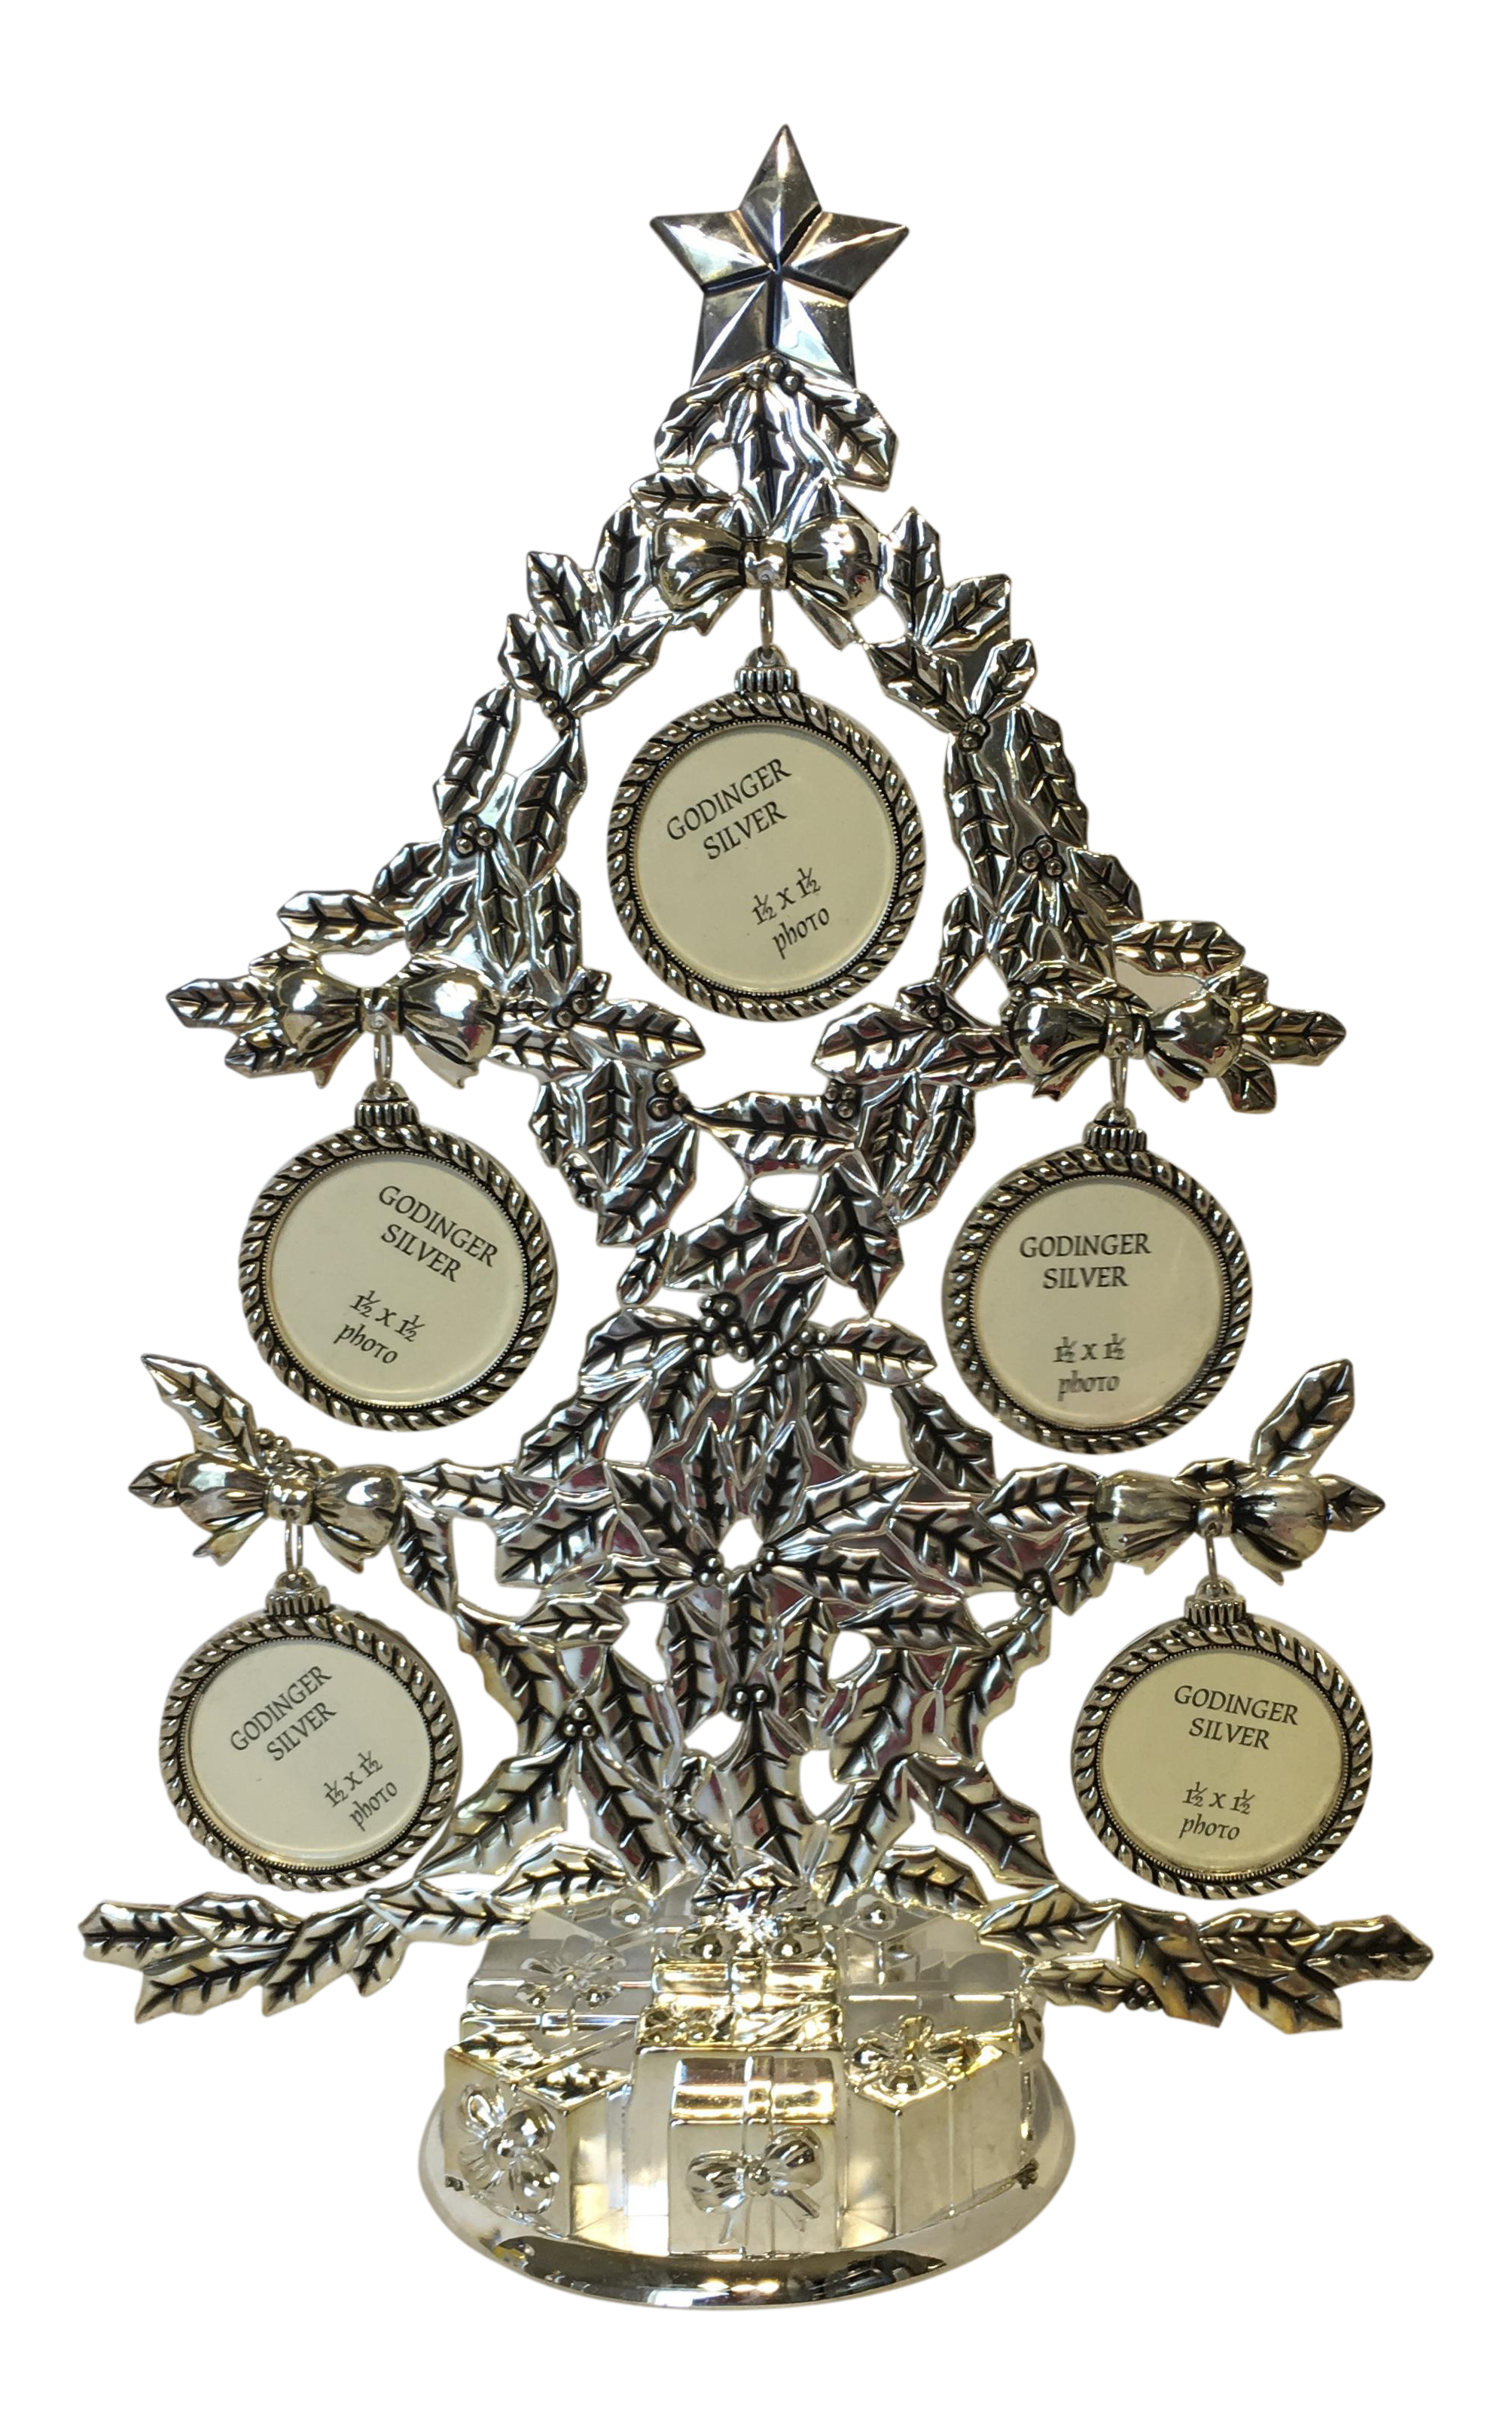 Godinger Silver-Plate Christmas Family Tree Photo Frame | Chairish